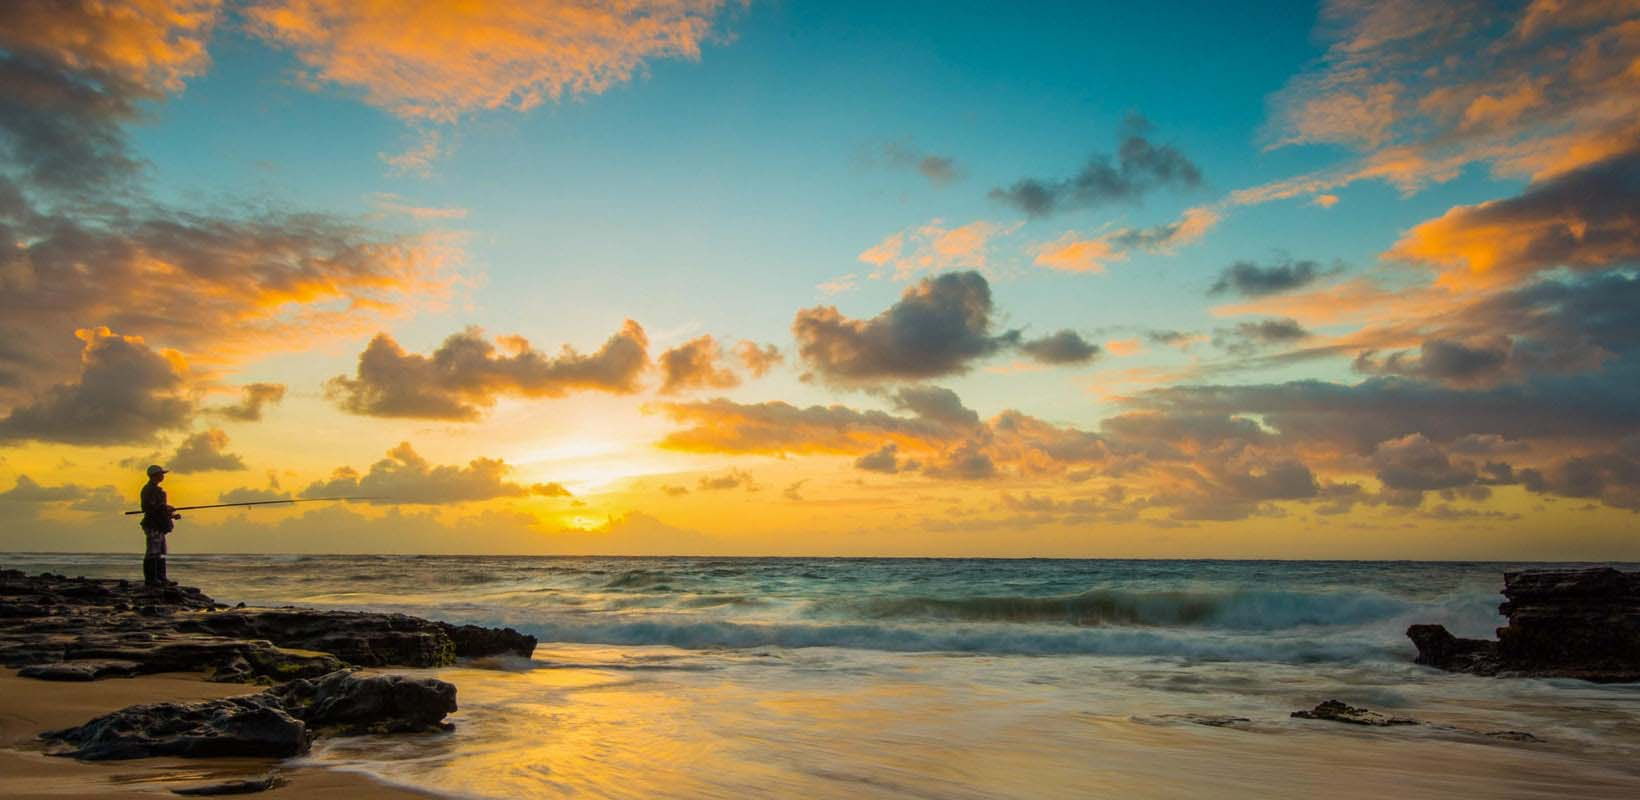 Hawaii Circle Island Sunrise photo tour